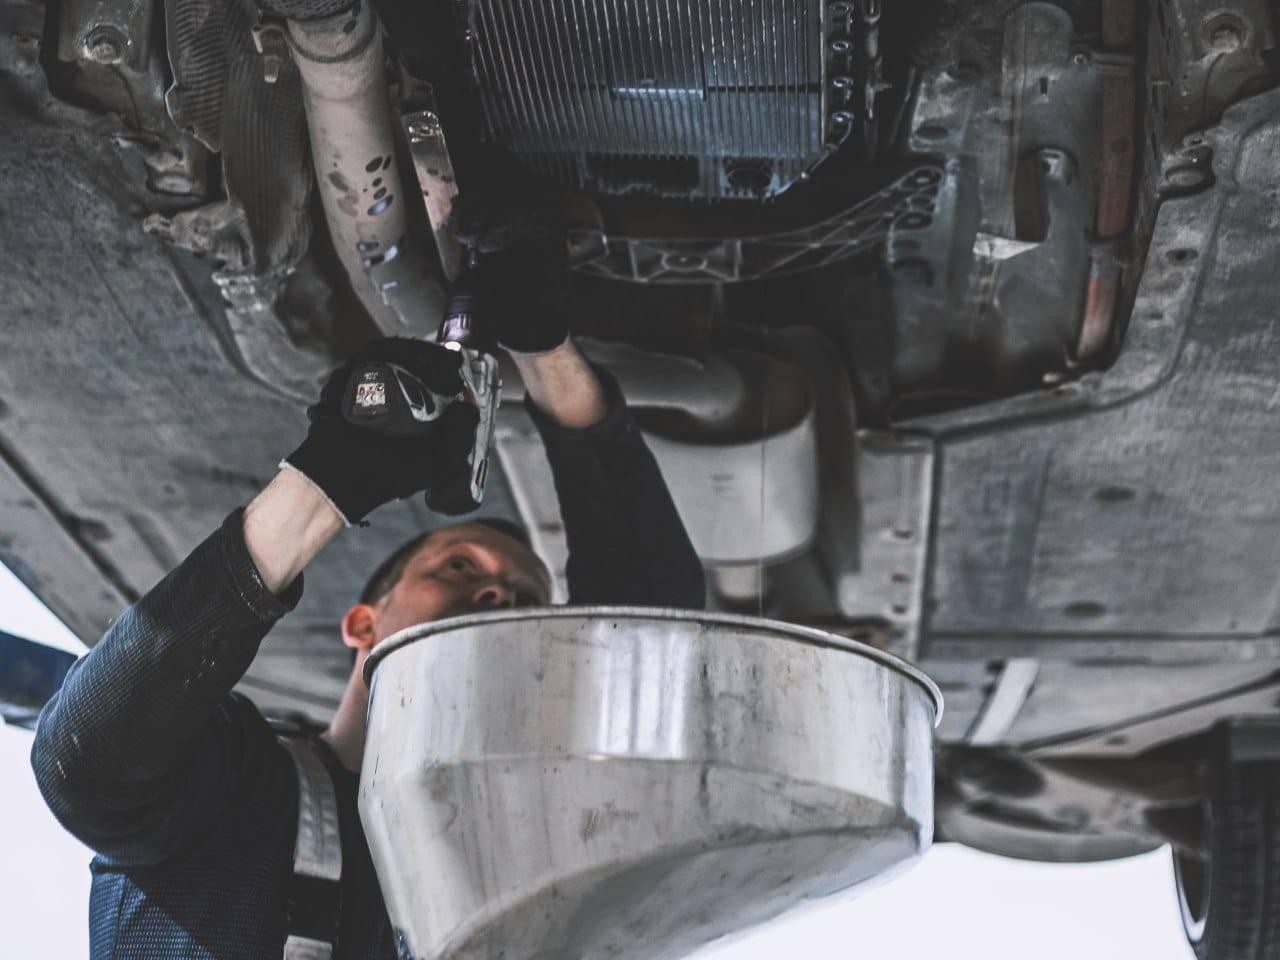 Замена масла АКПП ZF GA6HP19 на BMW 520d E60 1